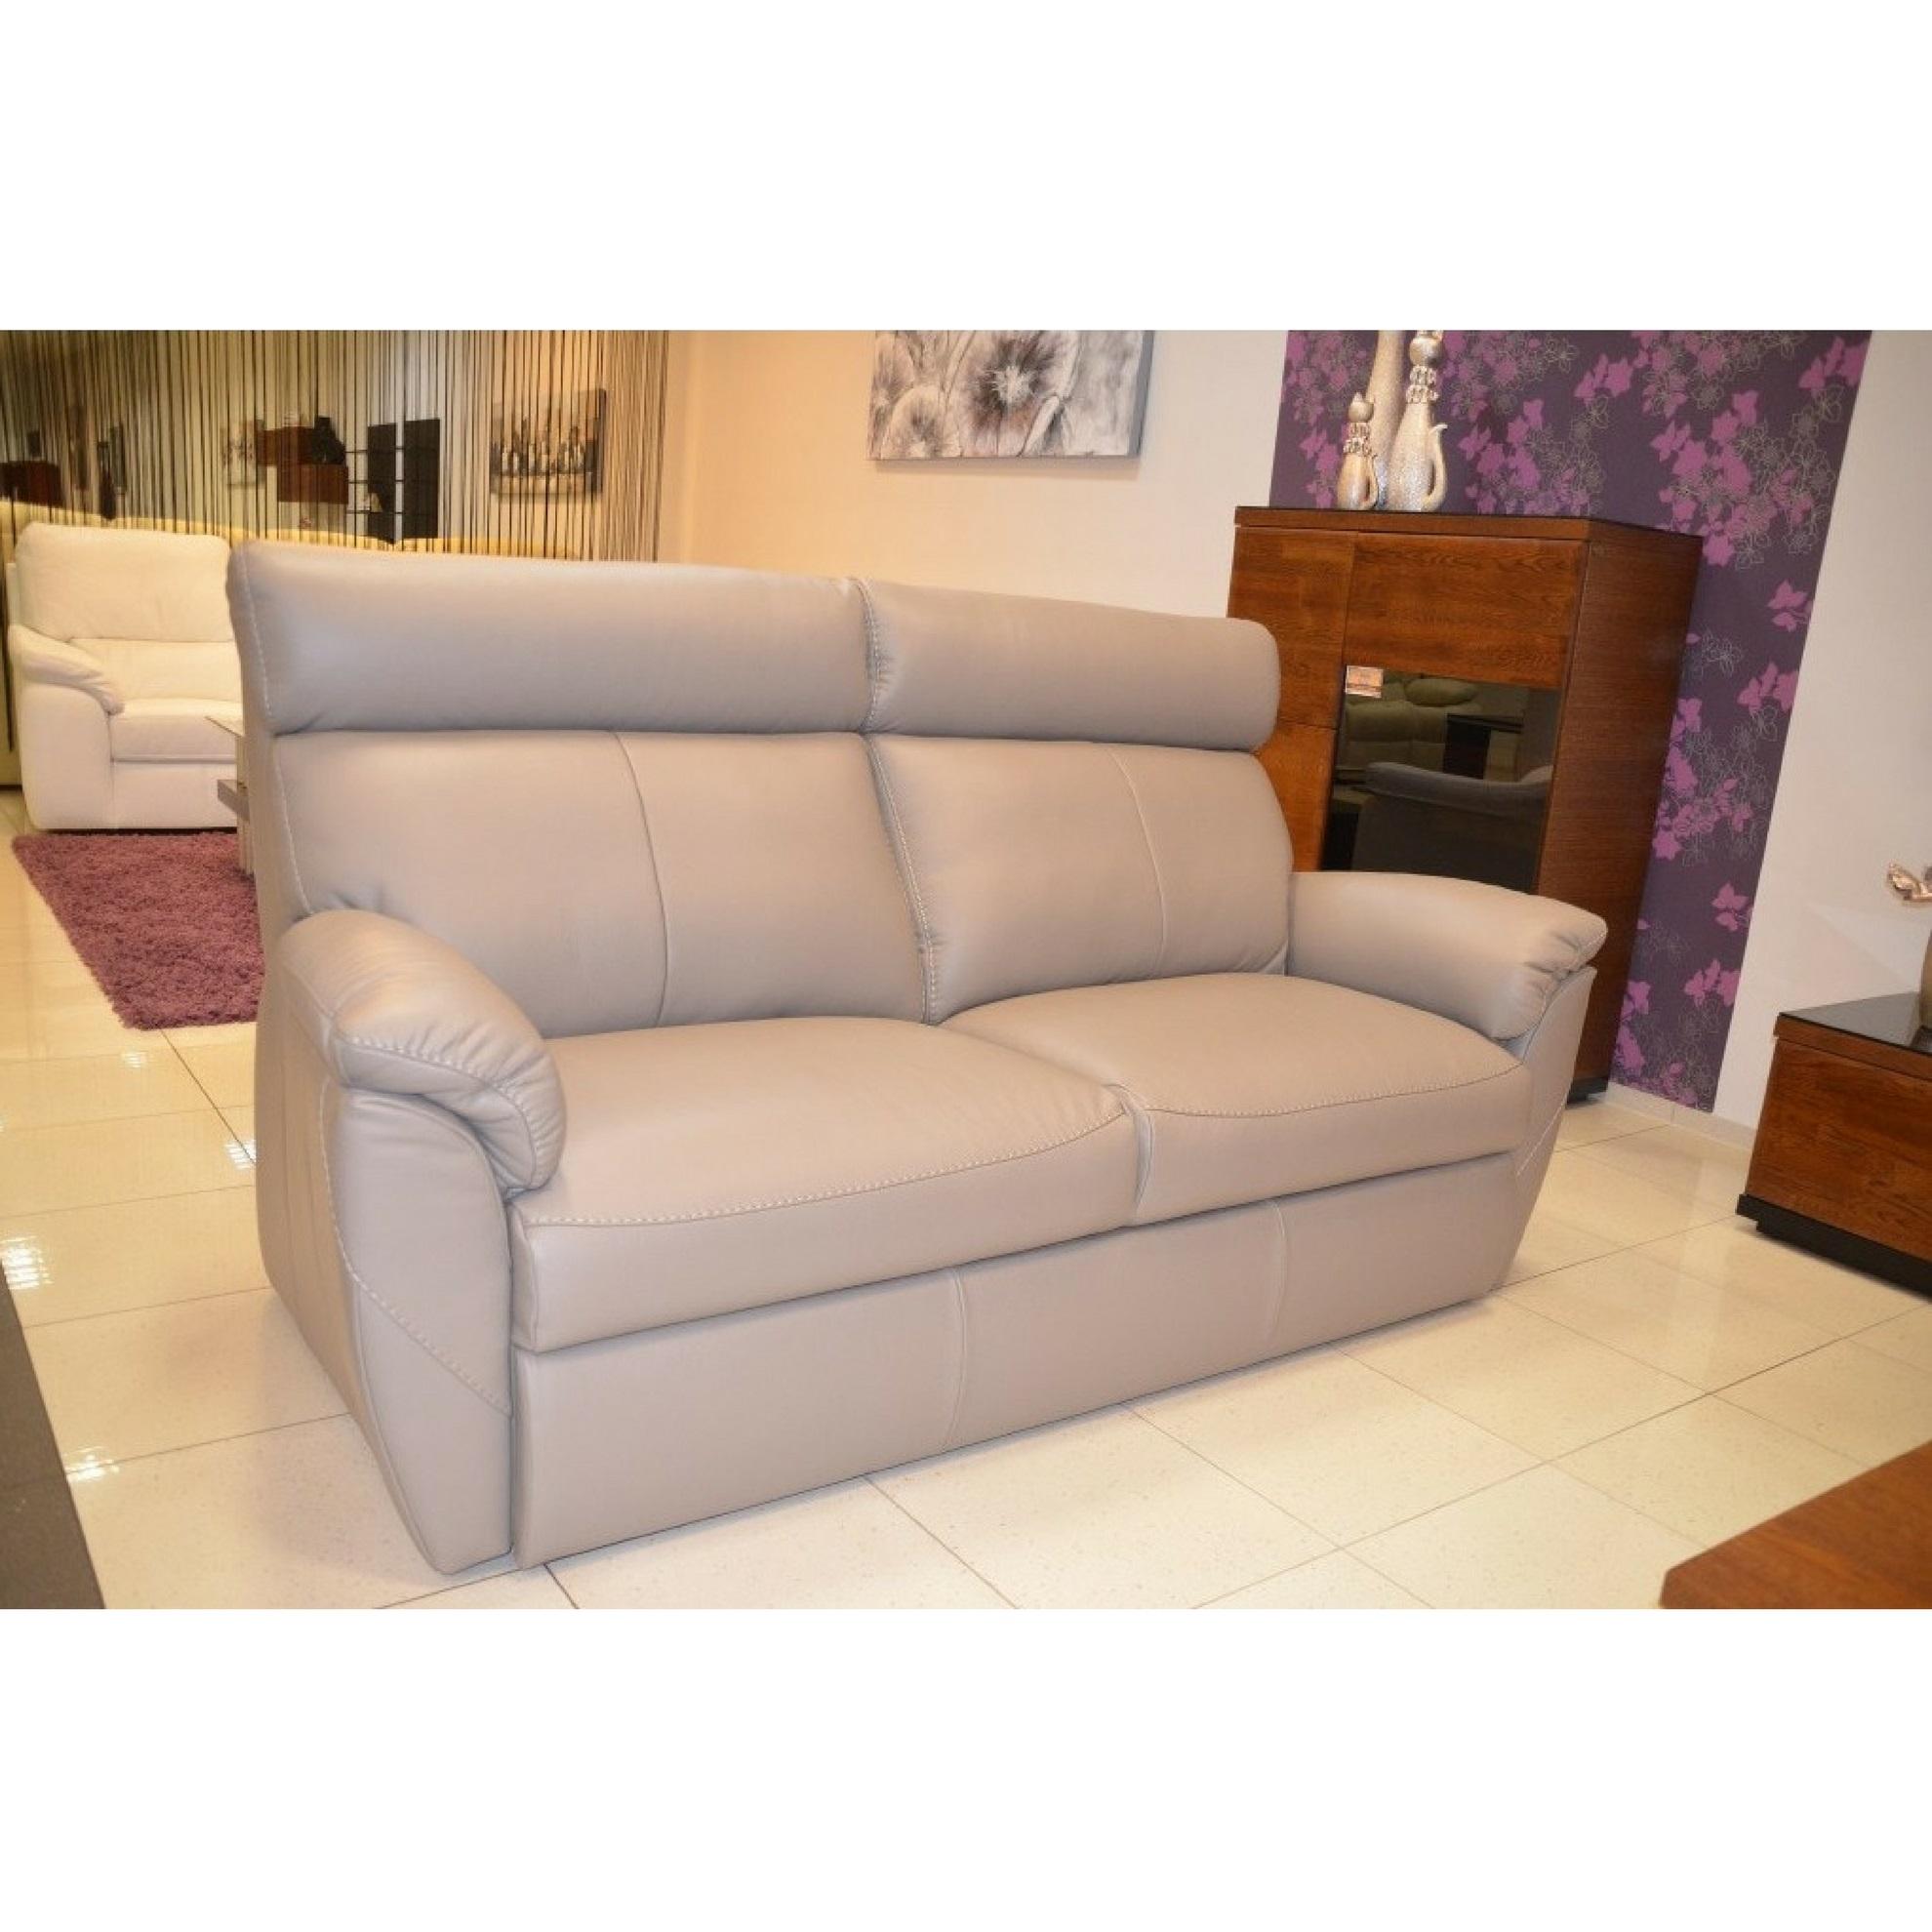 Porto 2 seat Sofa bed 2